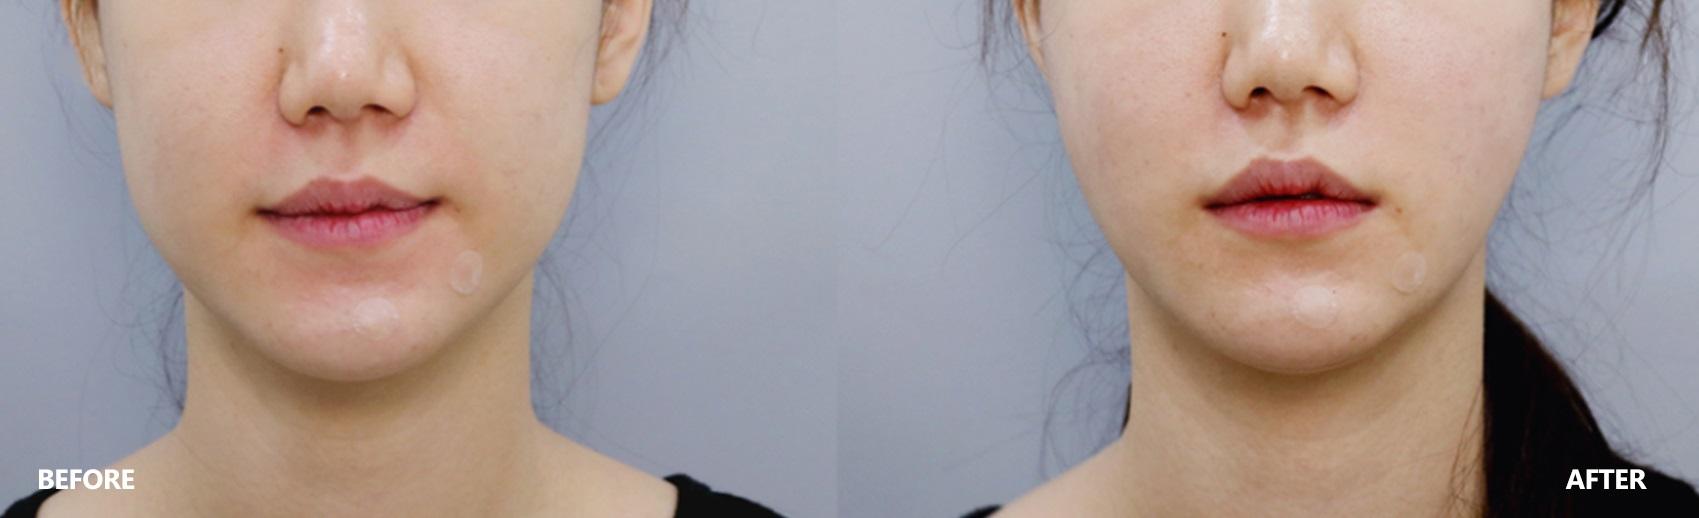 skin-lifting-result